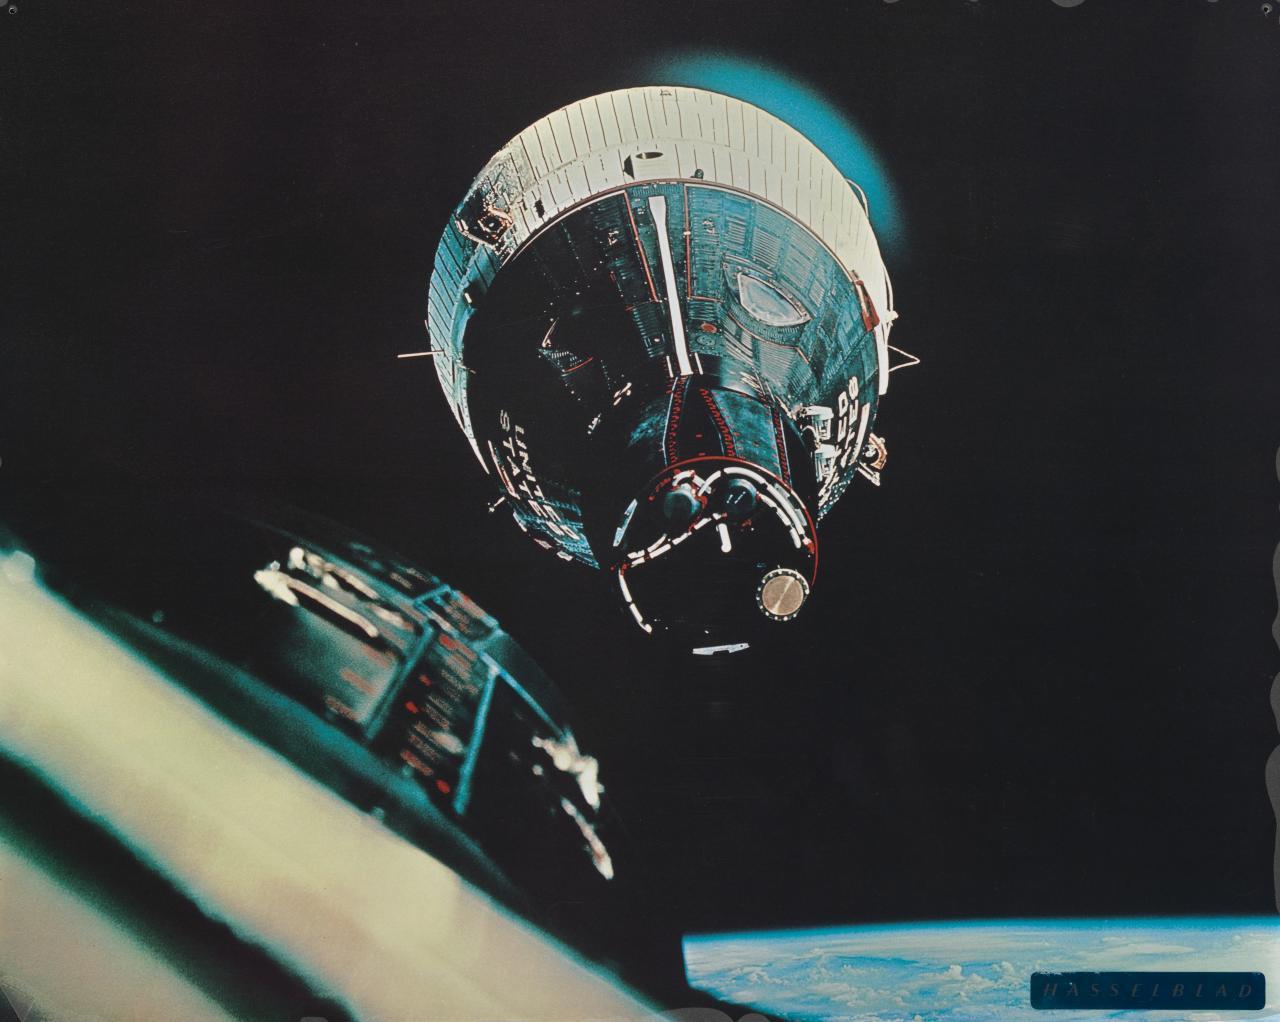 [ISS] Expédition 63 - Page 5 Retrieve